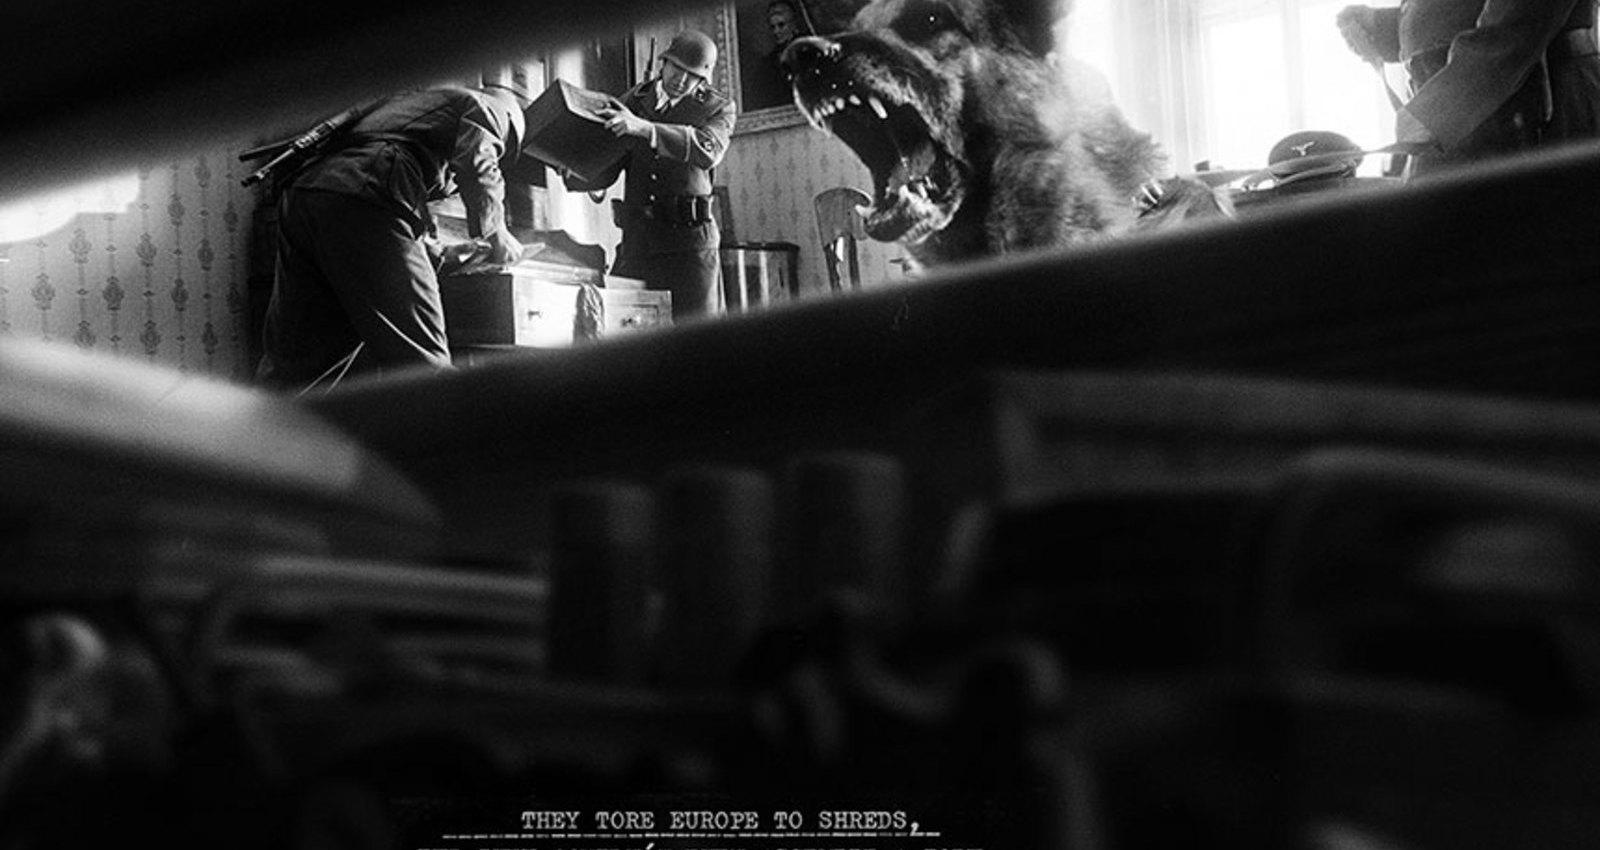 Harley Second World War